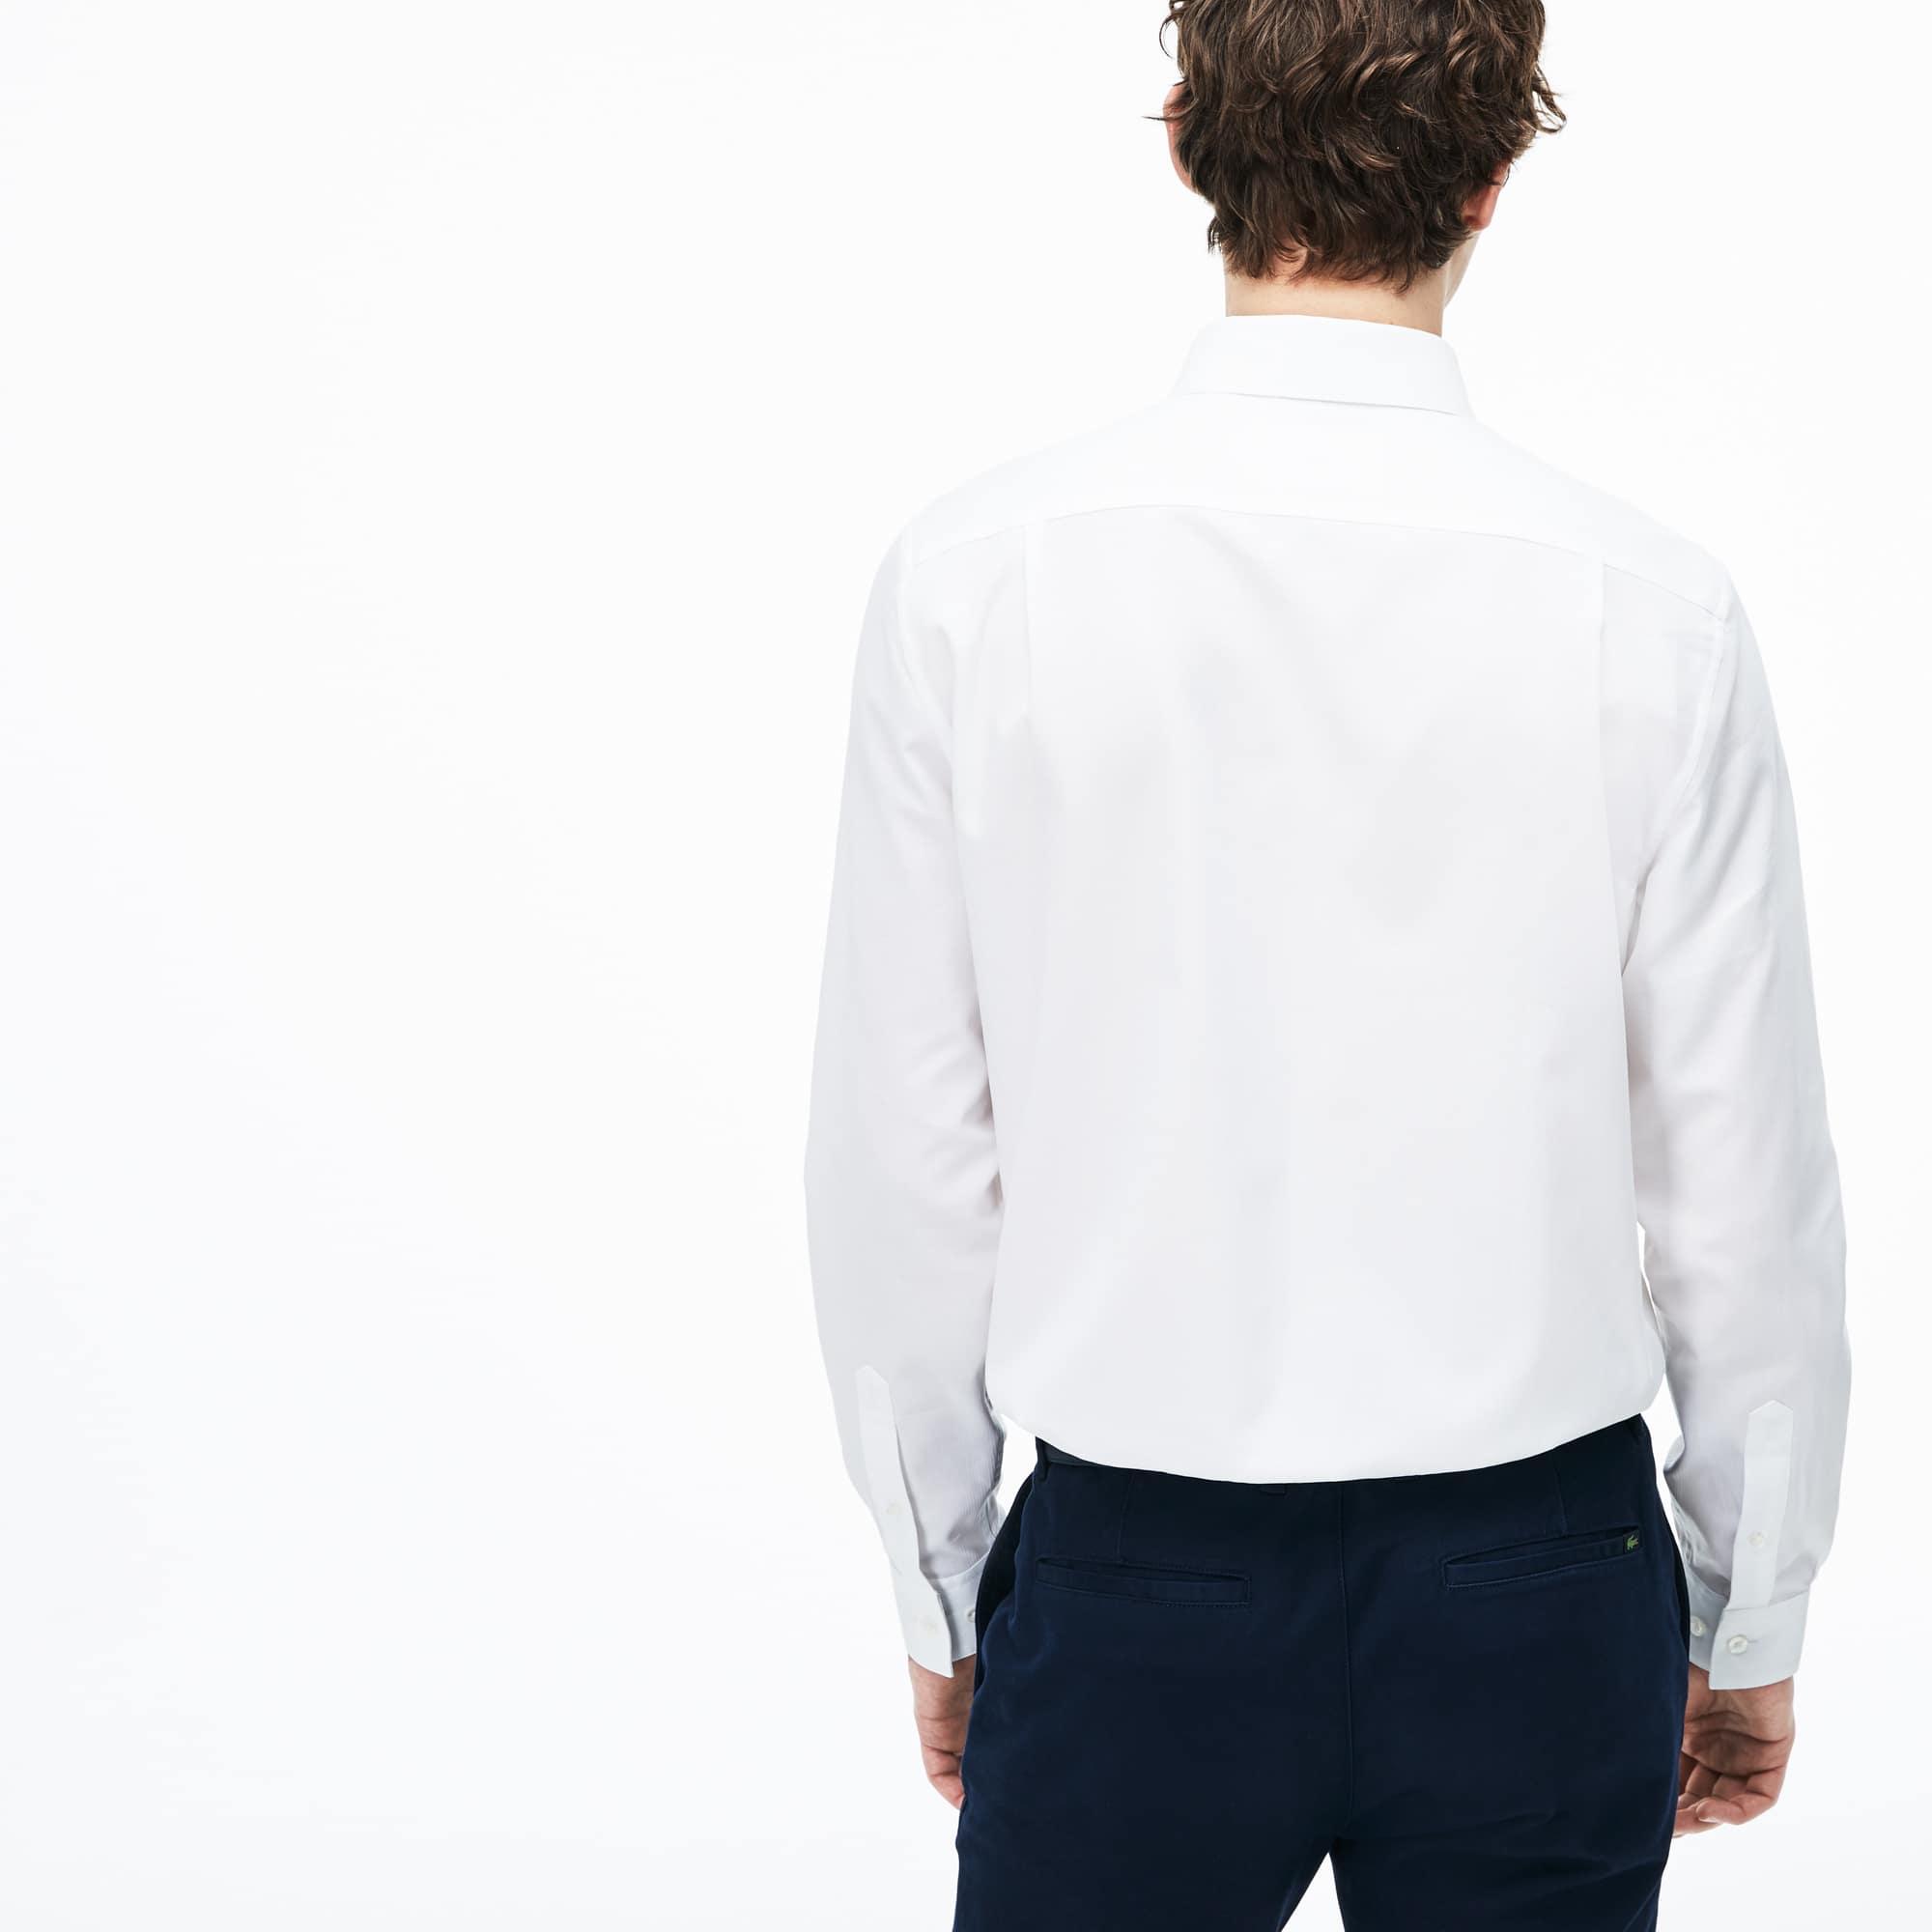 Lacoste - Regular Fit Herren-Hemd aus strukturierter Popeline - 3